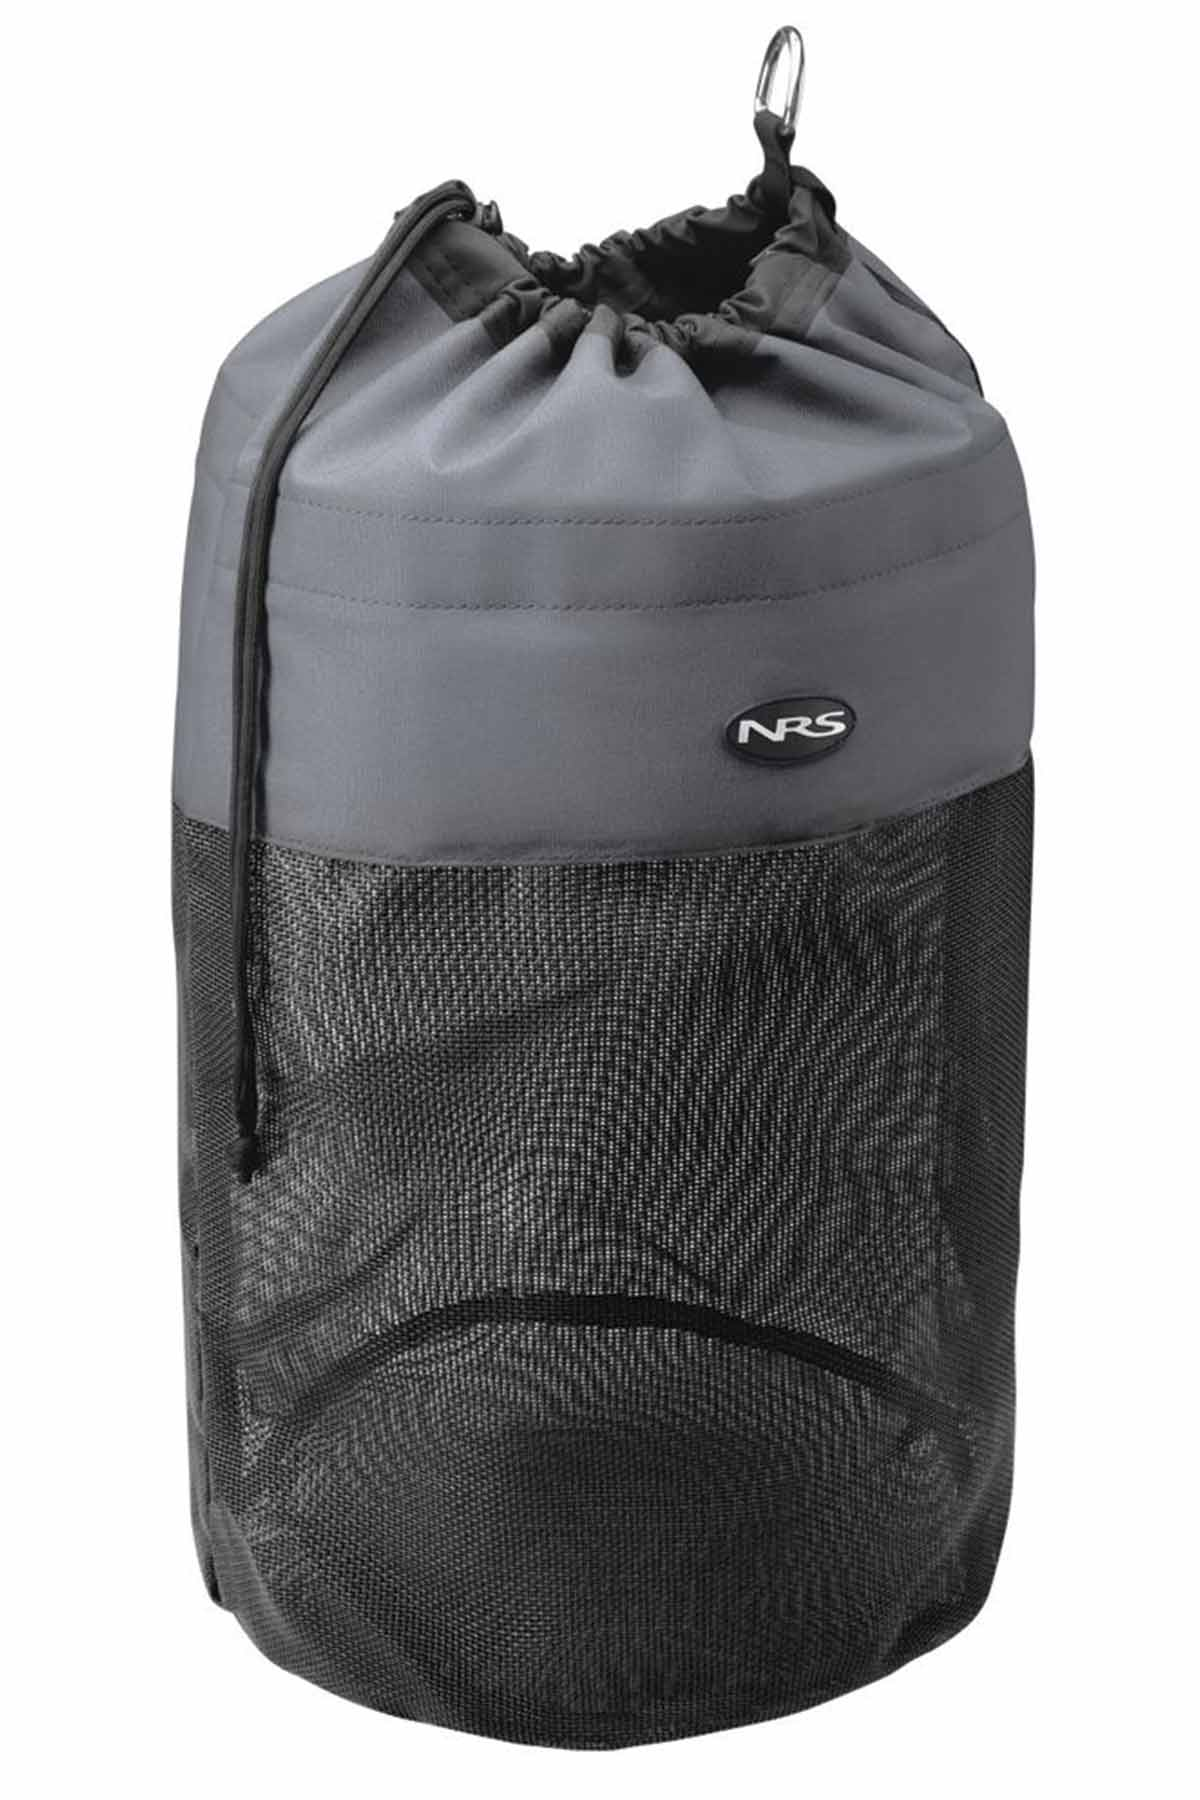 NRS Drag Bag Black